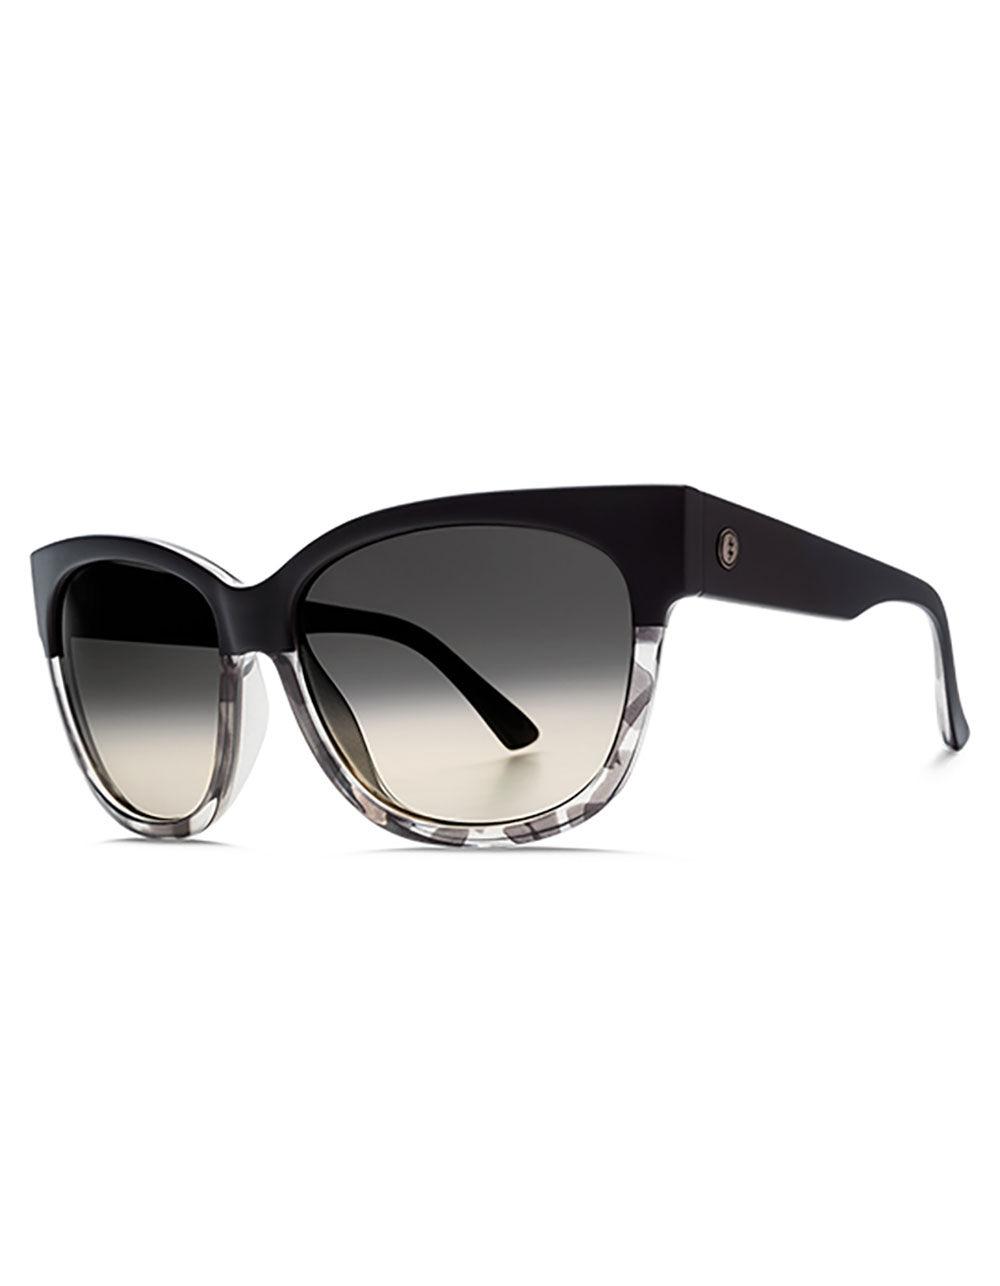 ELECTRIC Danger Cat Darkstone Sunglasses